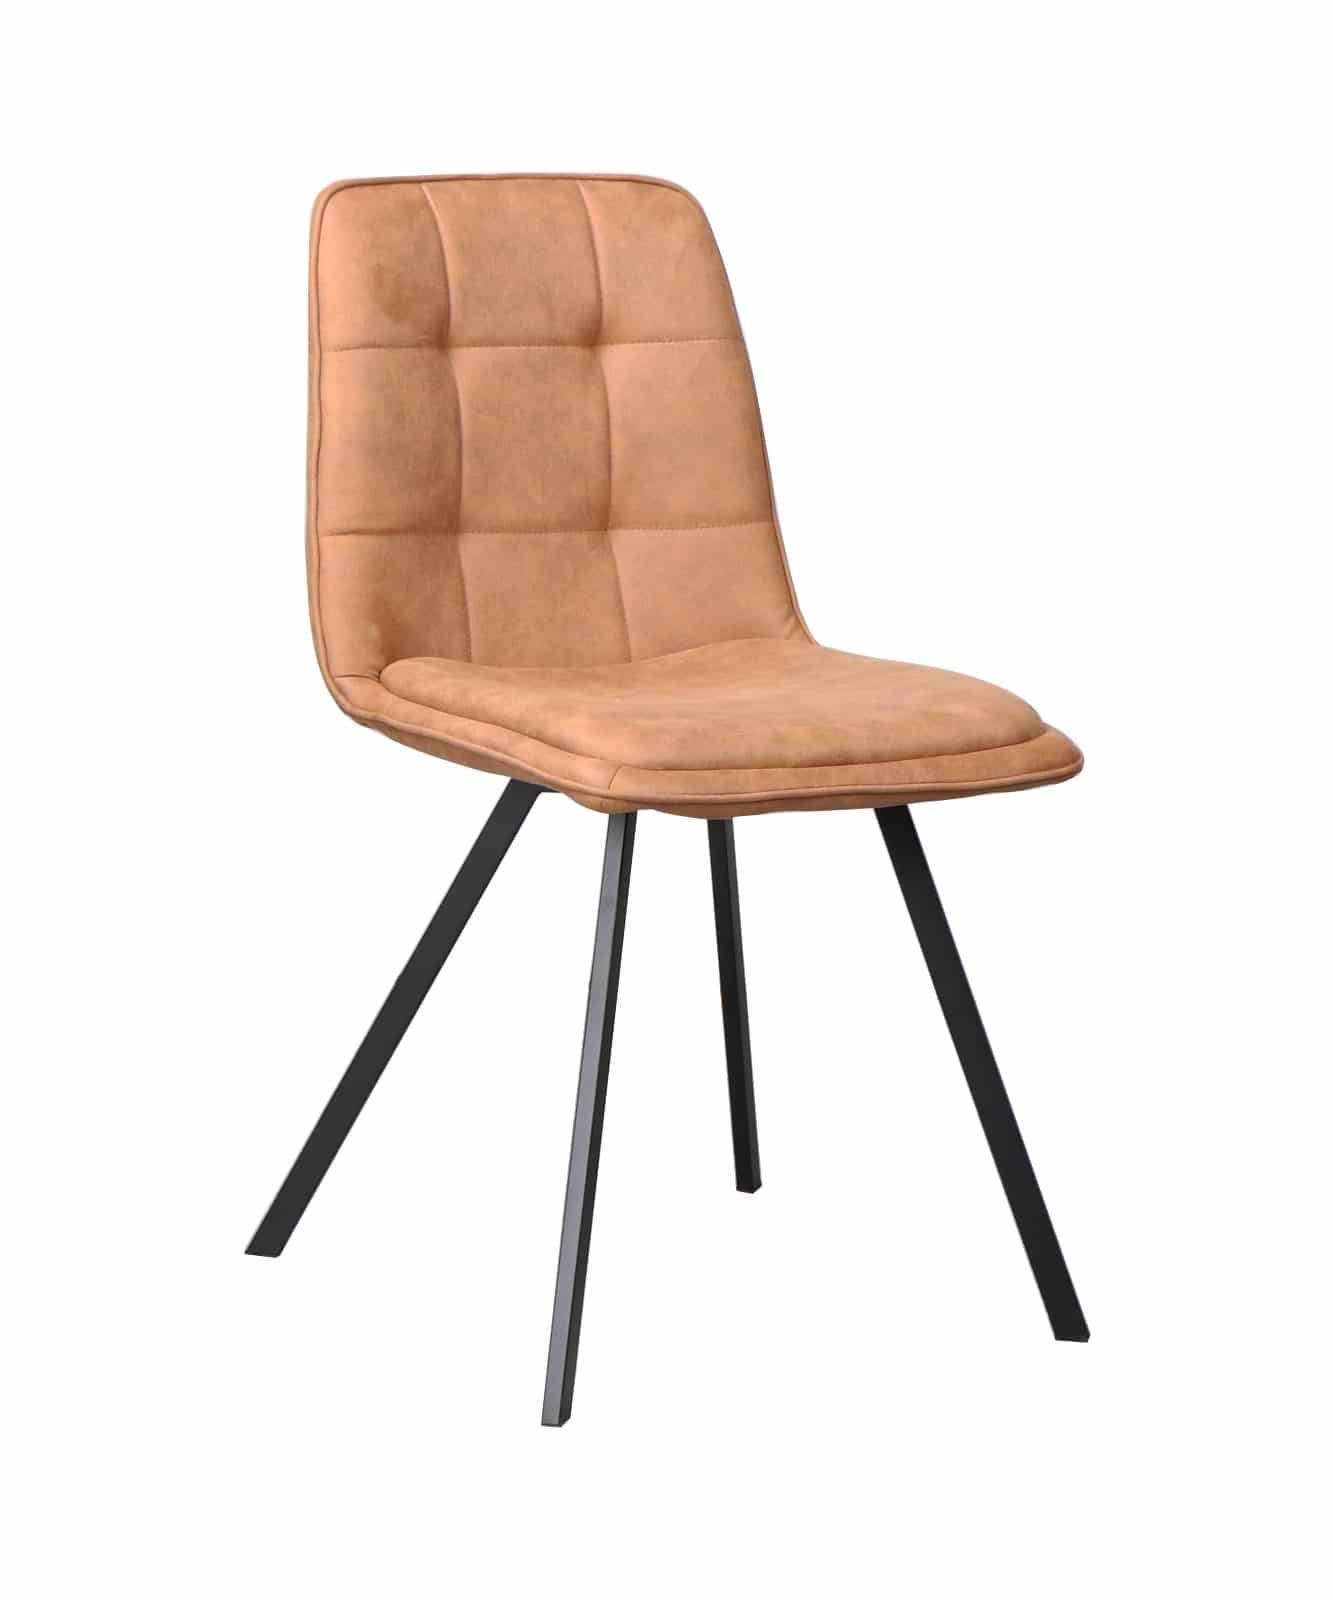 Harv Chair Douce Cognac 2x